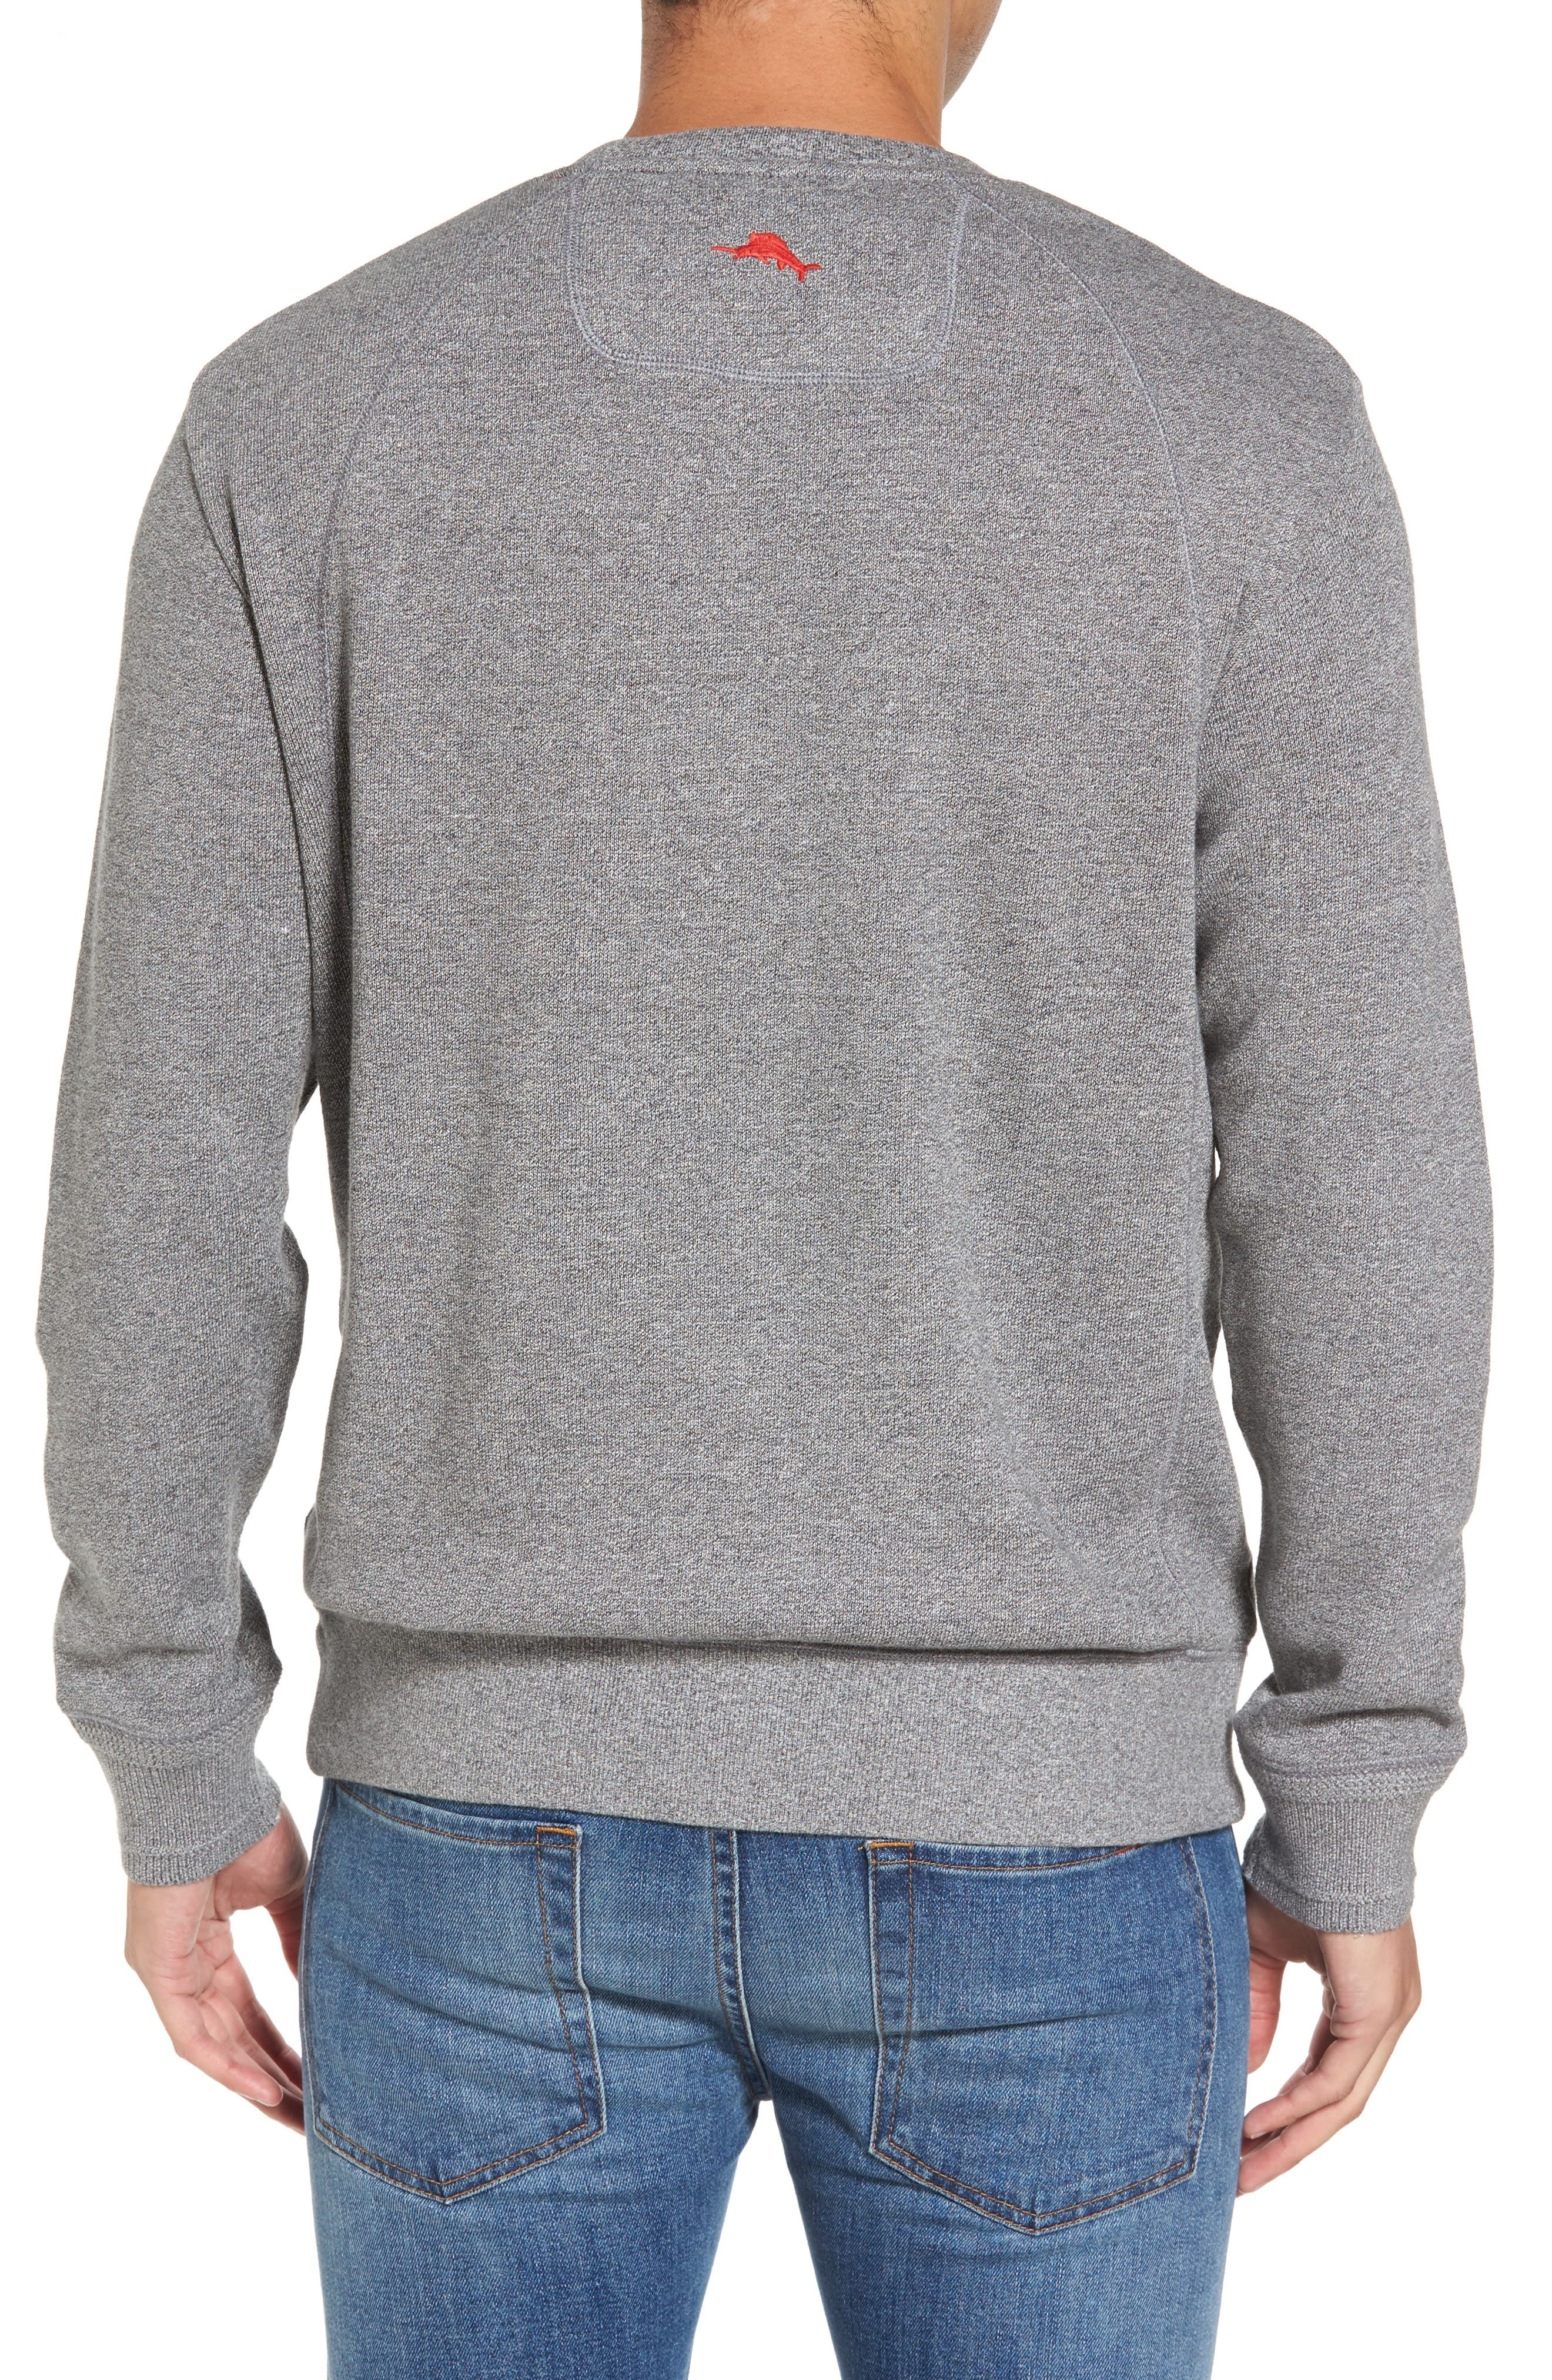 NFL Stitch of Liberty Embroidered Crewneck Sweatshirt,                             Alternate thumbnail 42, color,